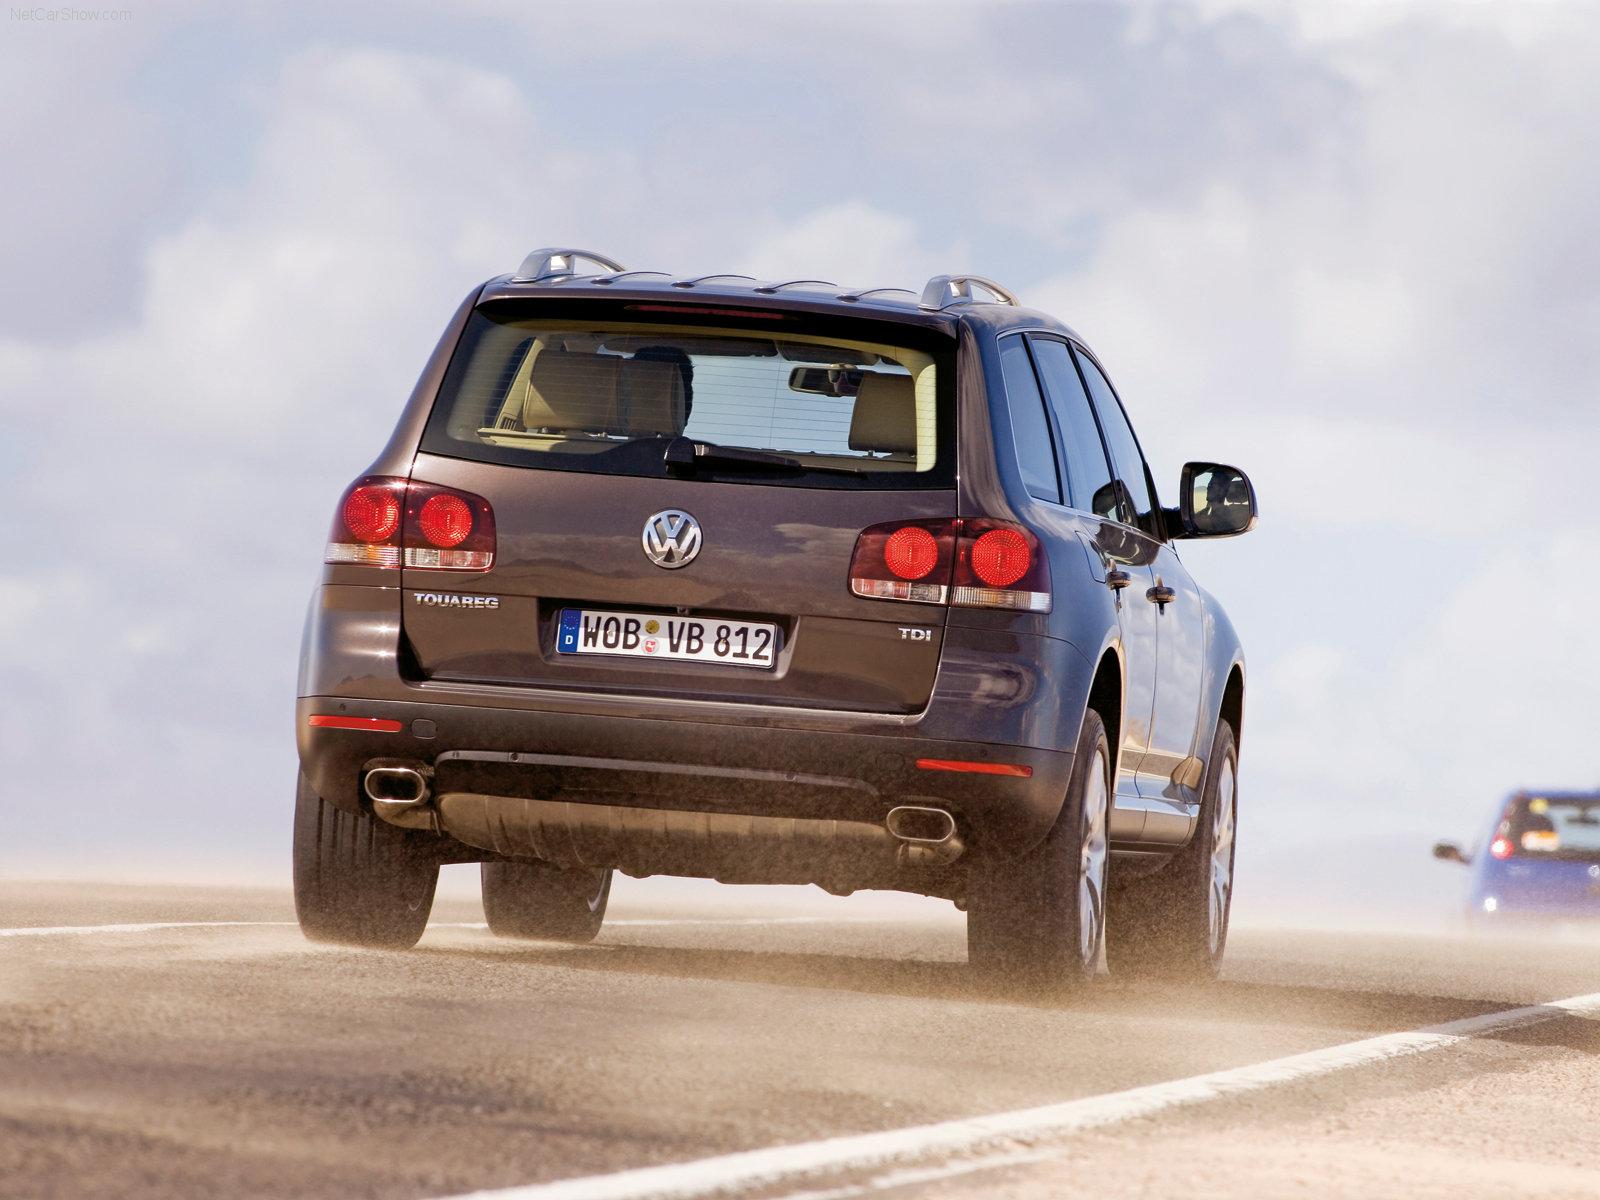 https://w04.ru/foto/Volkswagen-Touareg_2007_1600x1200_wallpaper_1c.jpg